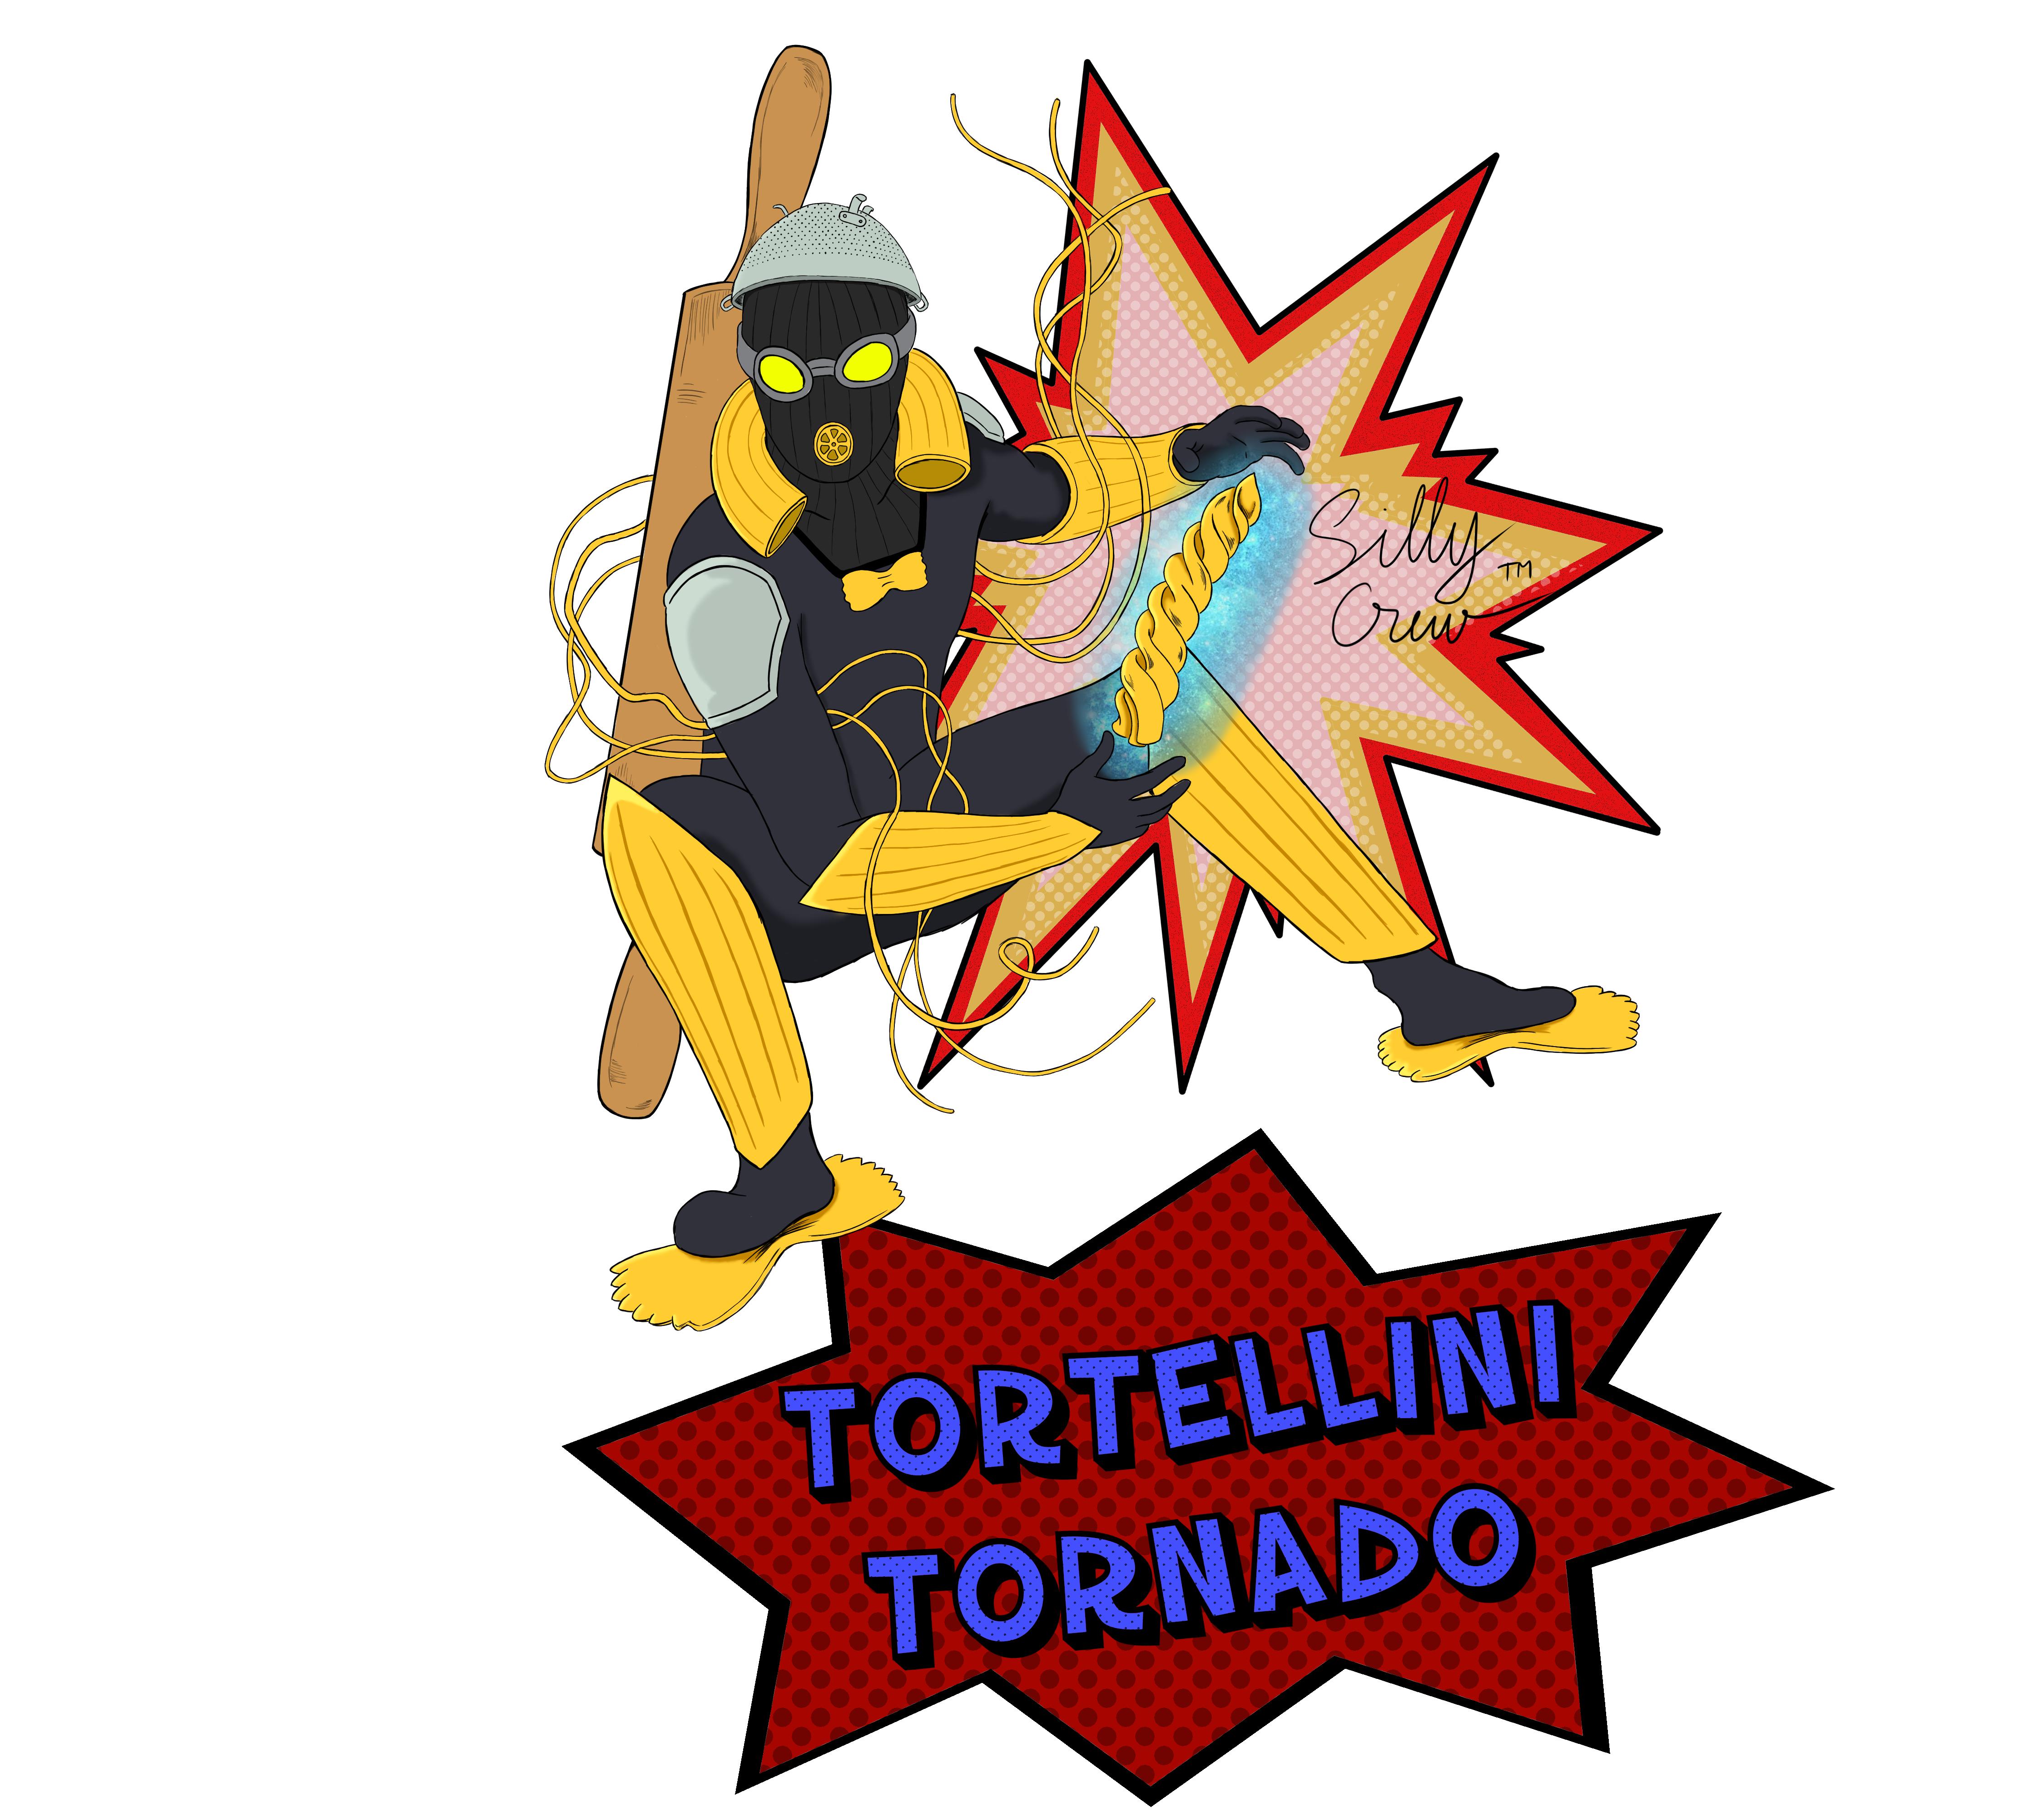 Tortellini tornado_Final